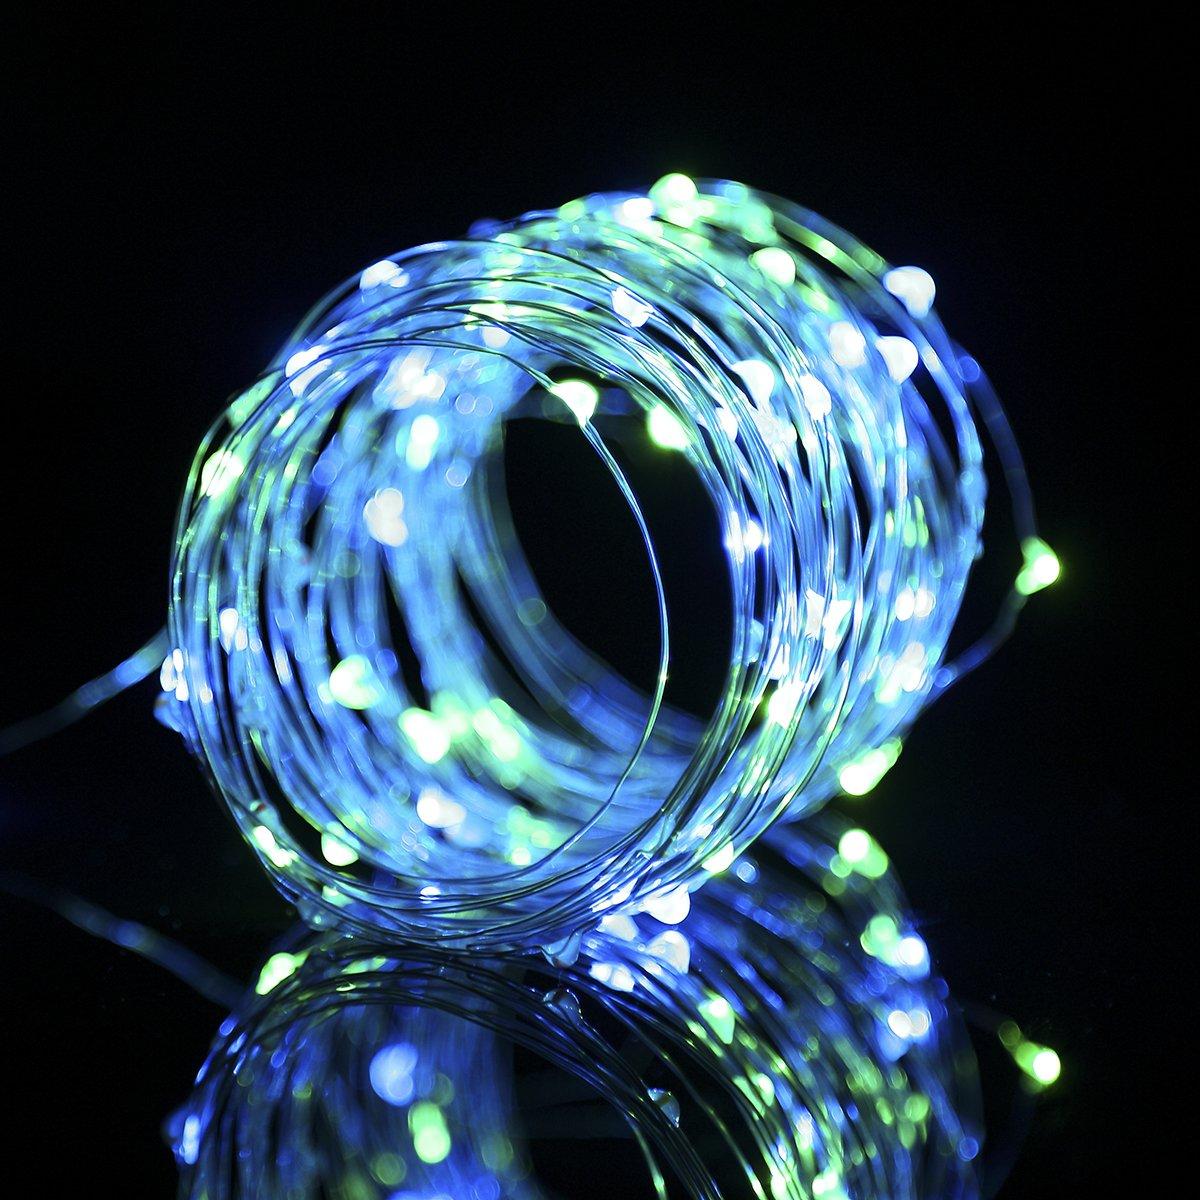 Amazon.com : B-right LED String Lights, 33ft 100 LEDs 8 Modes Copper ...